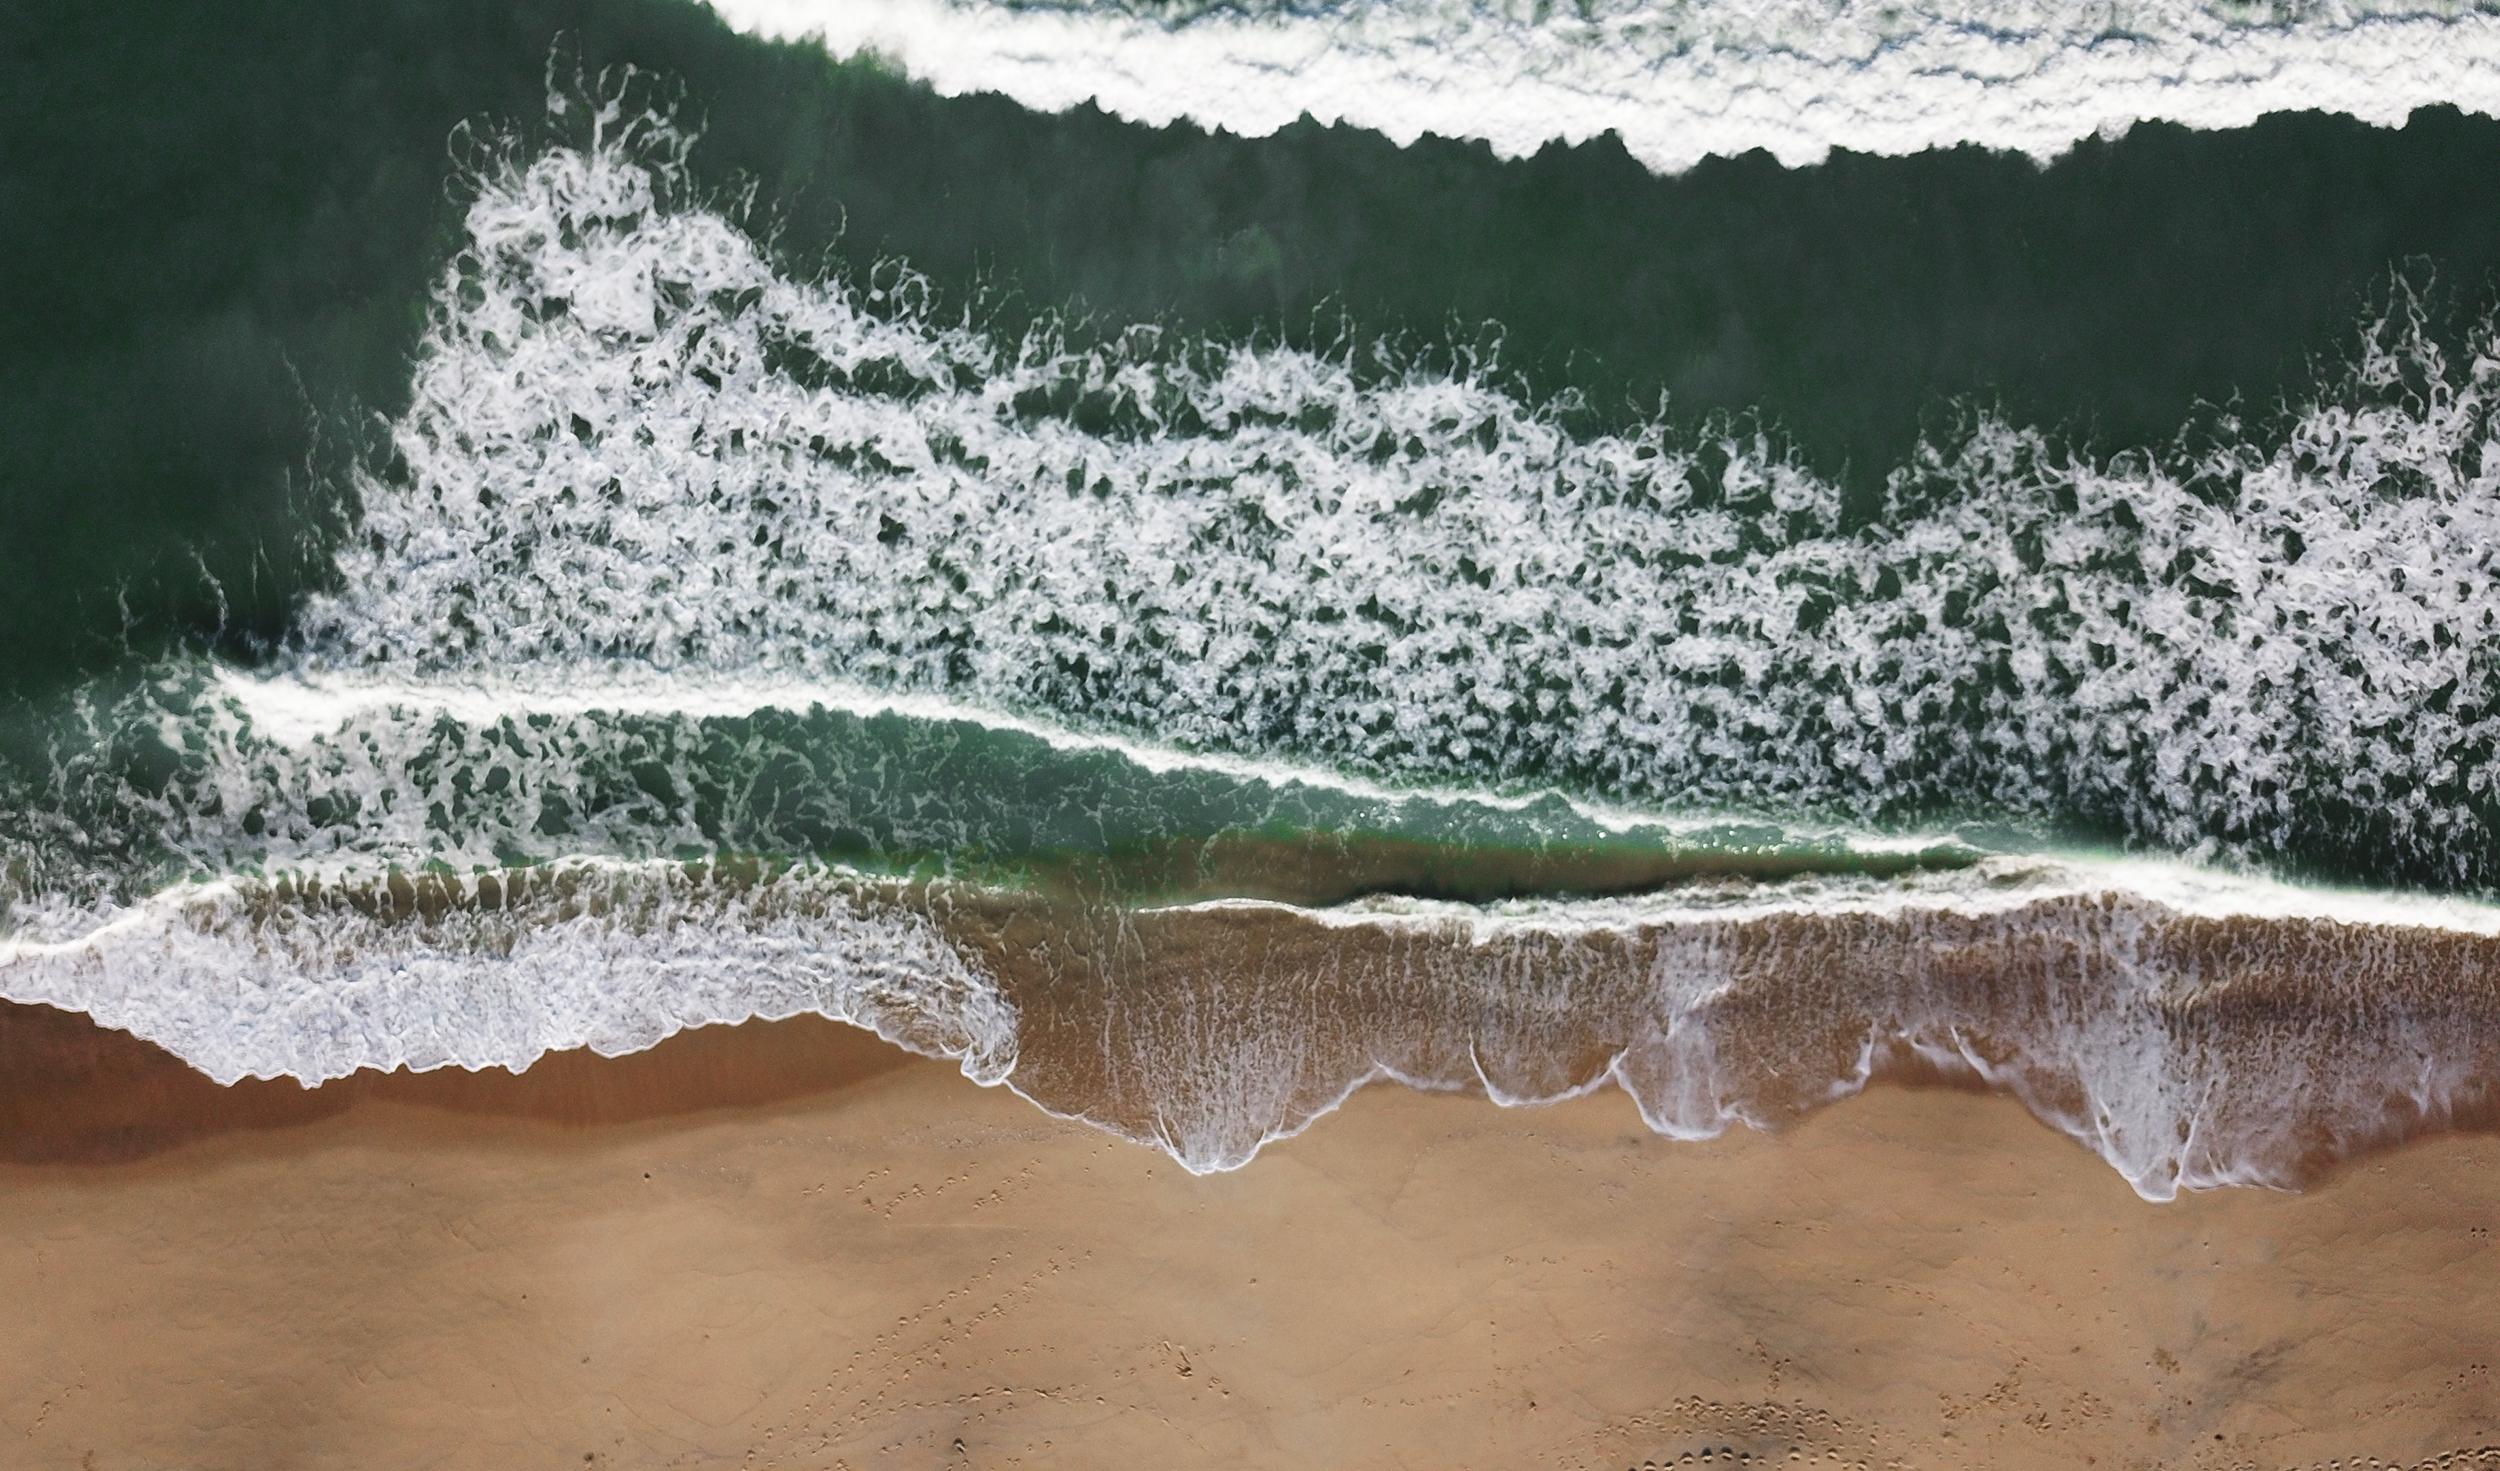 Waves in Bali